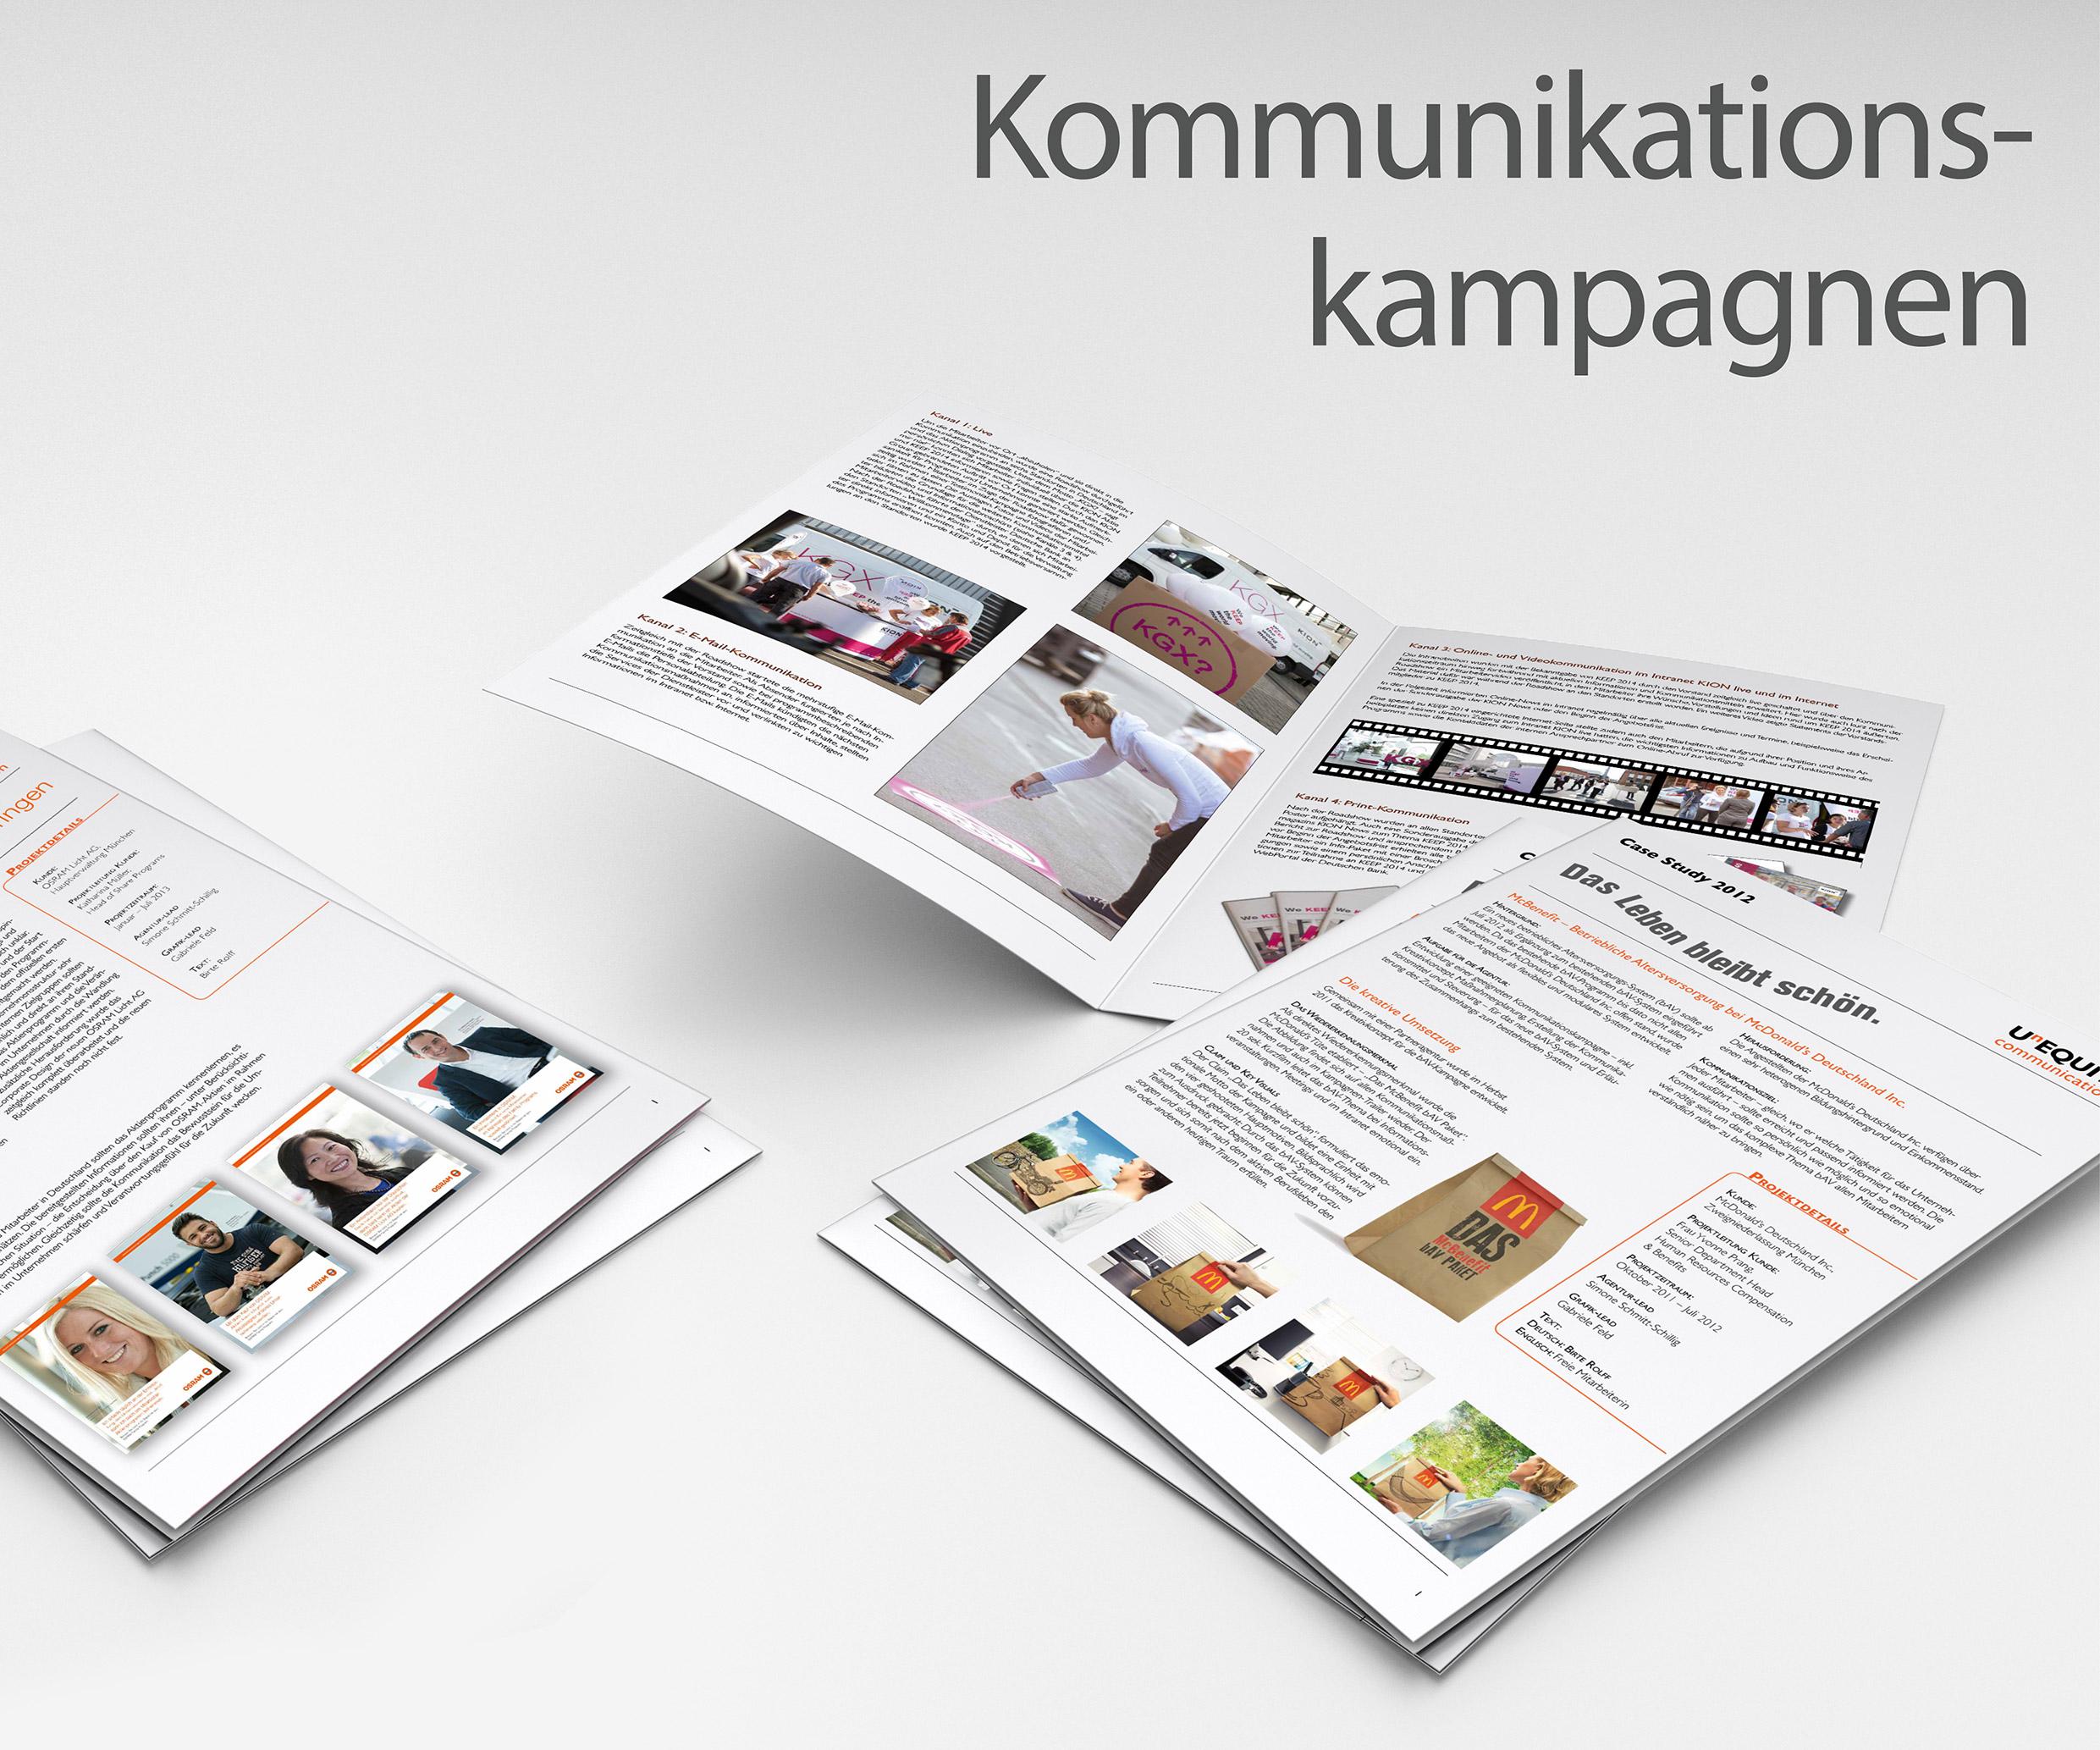 Kommunikation Kampagne